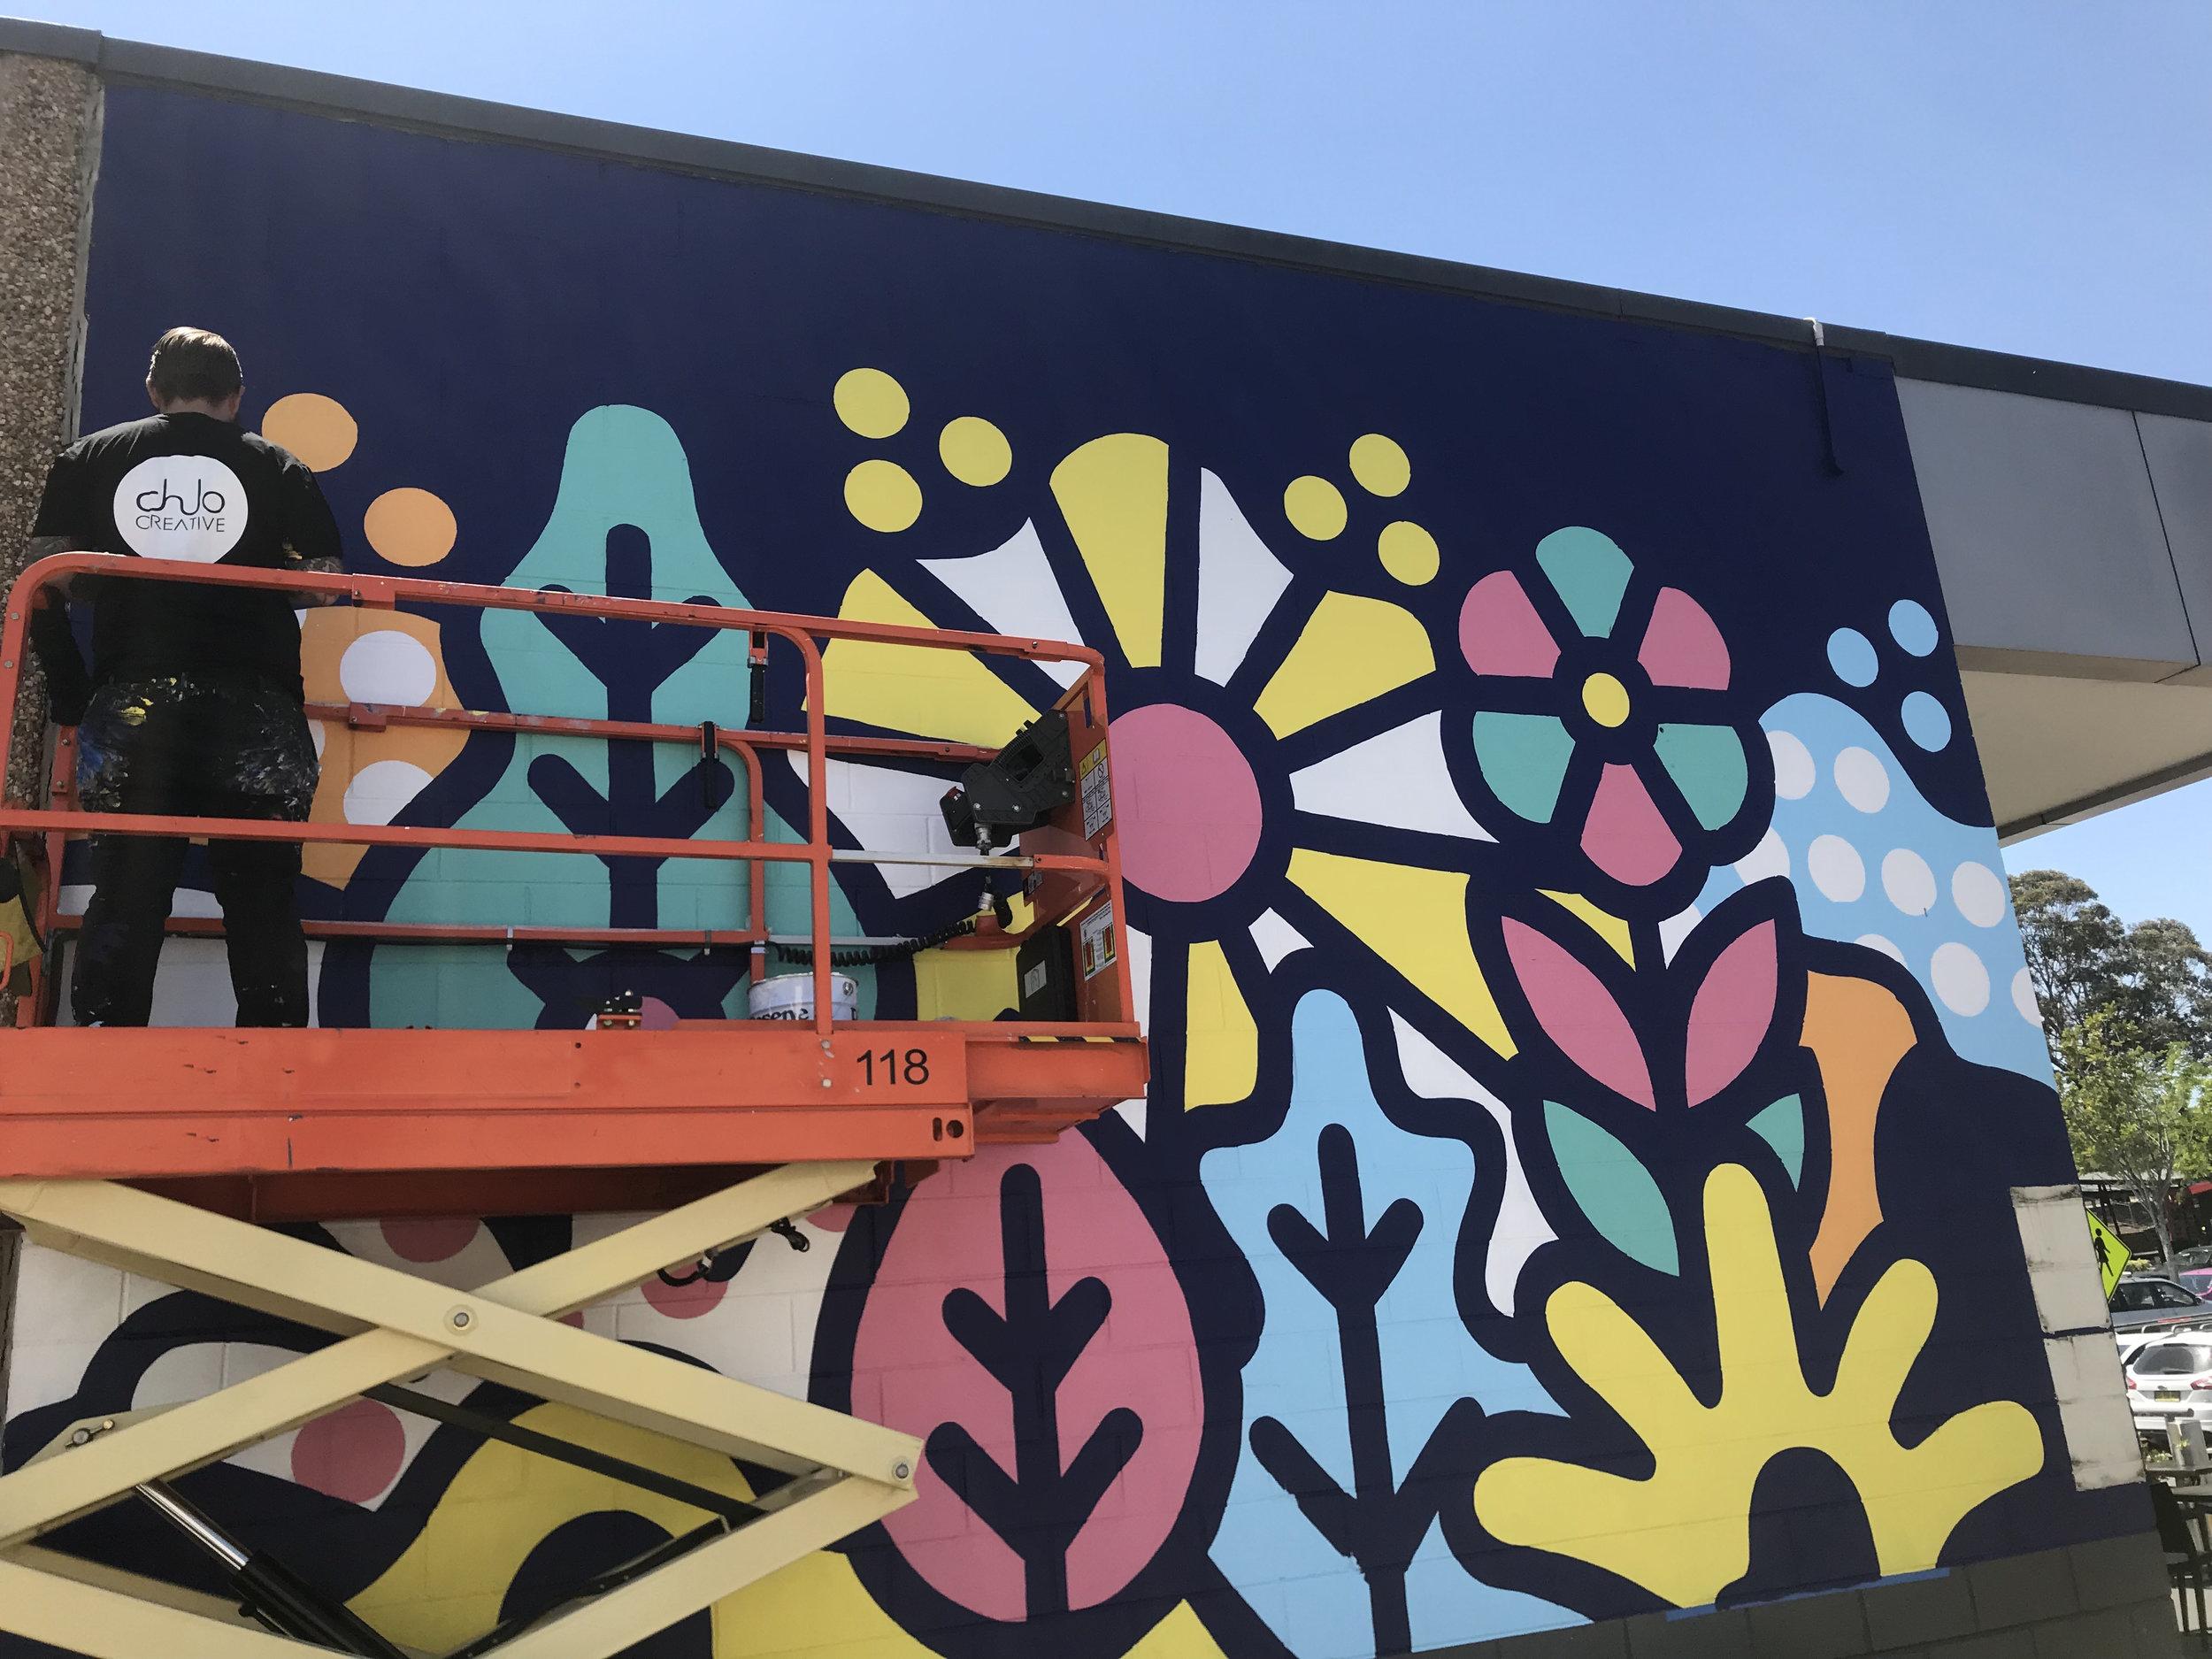 chulo-creative-mural-nico.jpg